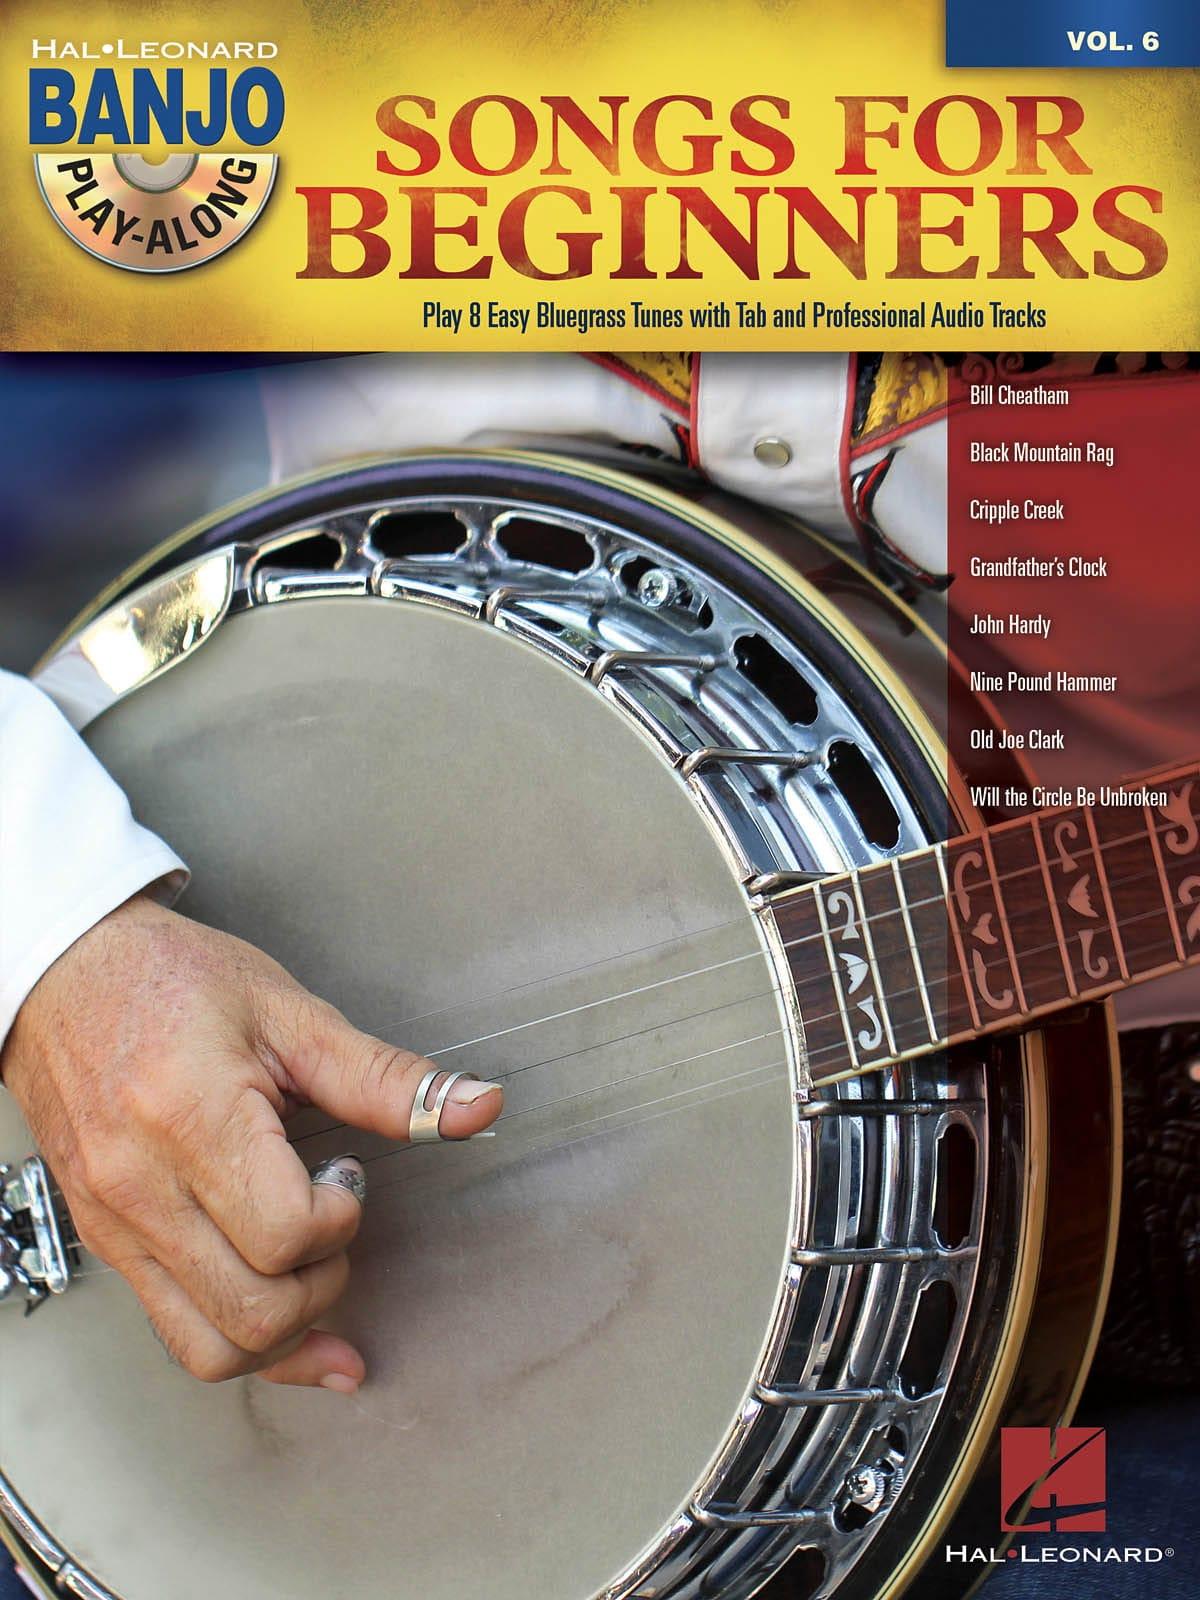 Banjo Play-Along Volume 6 - Songs for Beginners - laflutedepan.com